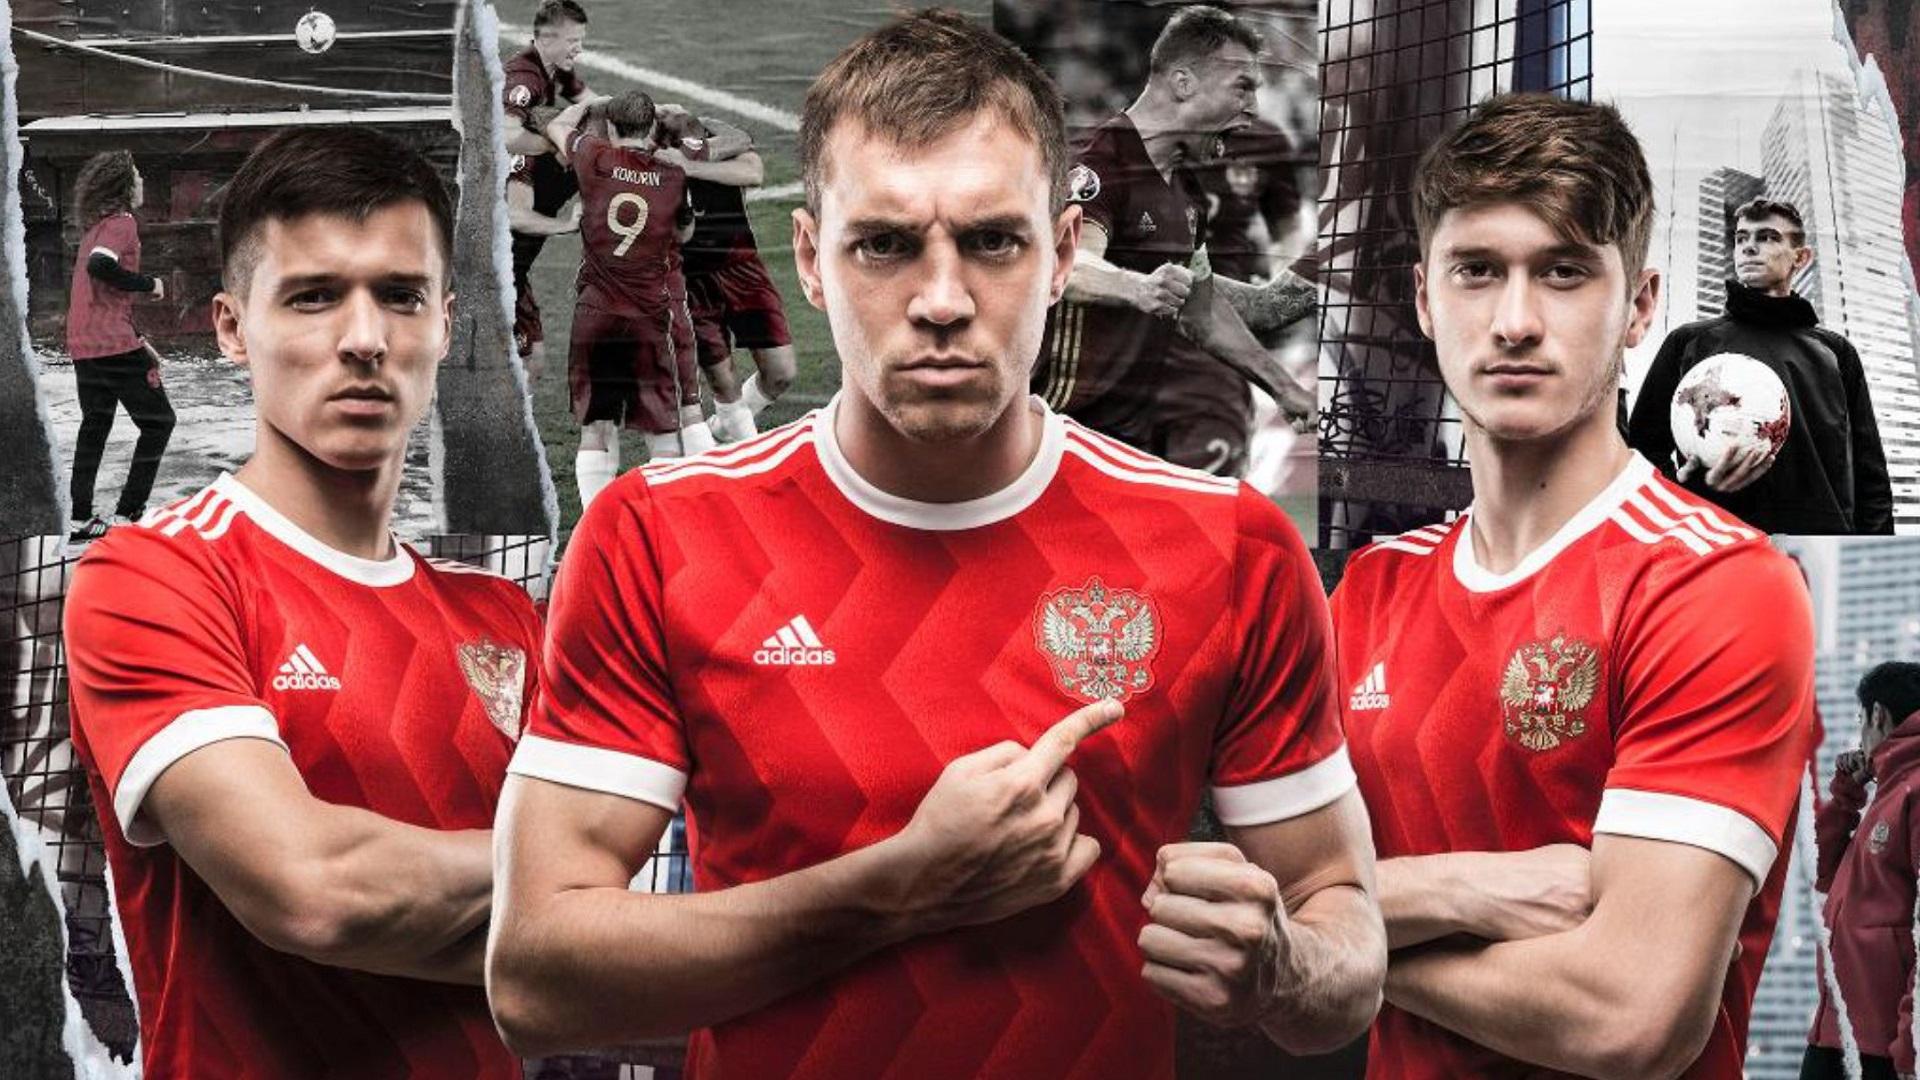 Daftar Lengkap Nominasi 100 Jersey Terbaik 2016 17 Celana Bola Grade Ori Madrid Away 2019 Russia Home Kit Confederation Cup